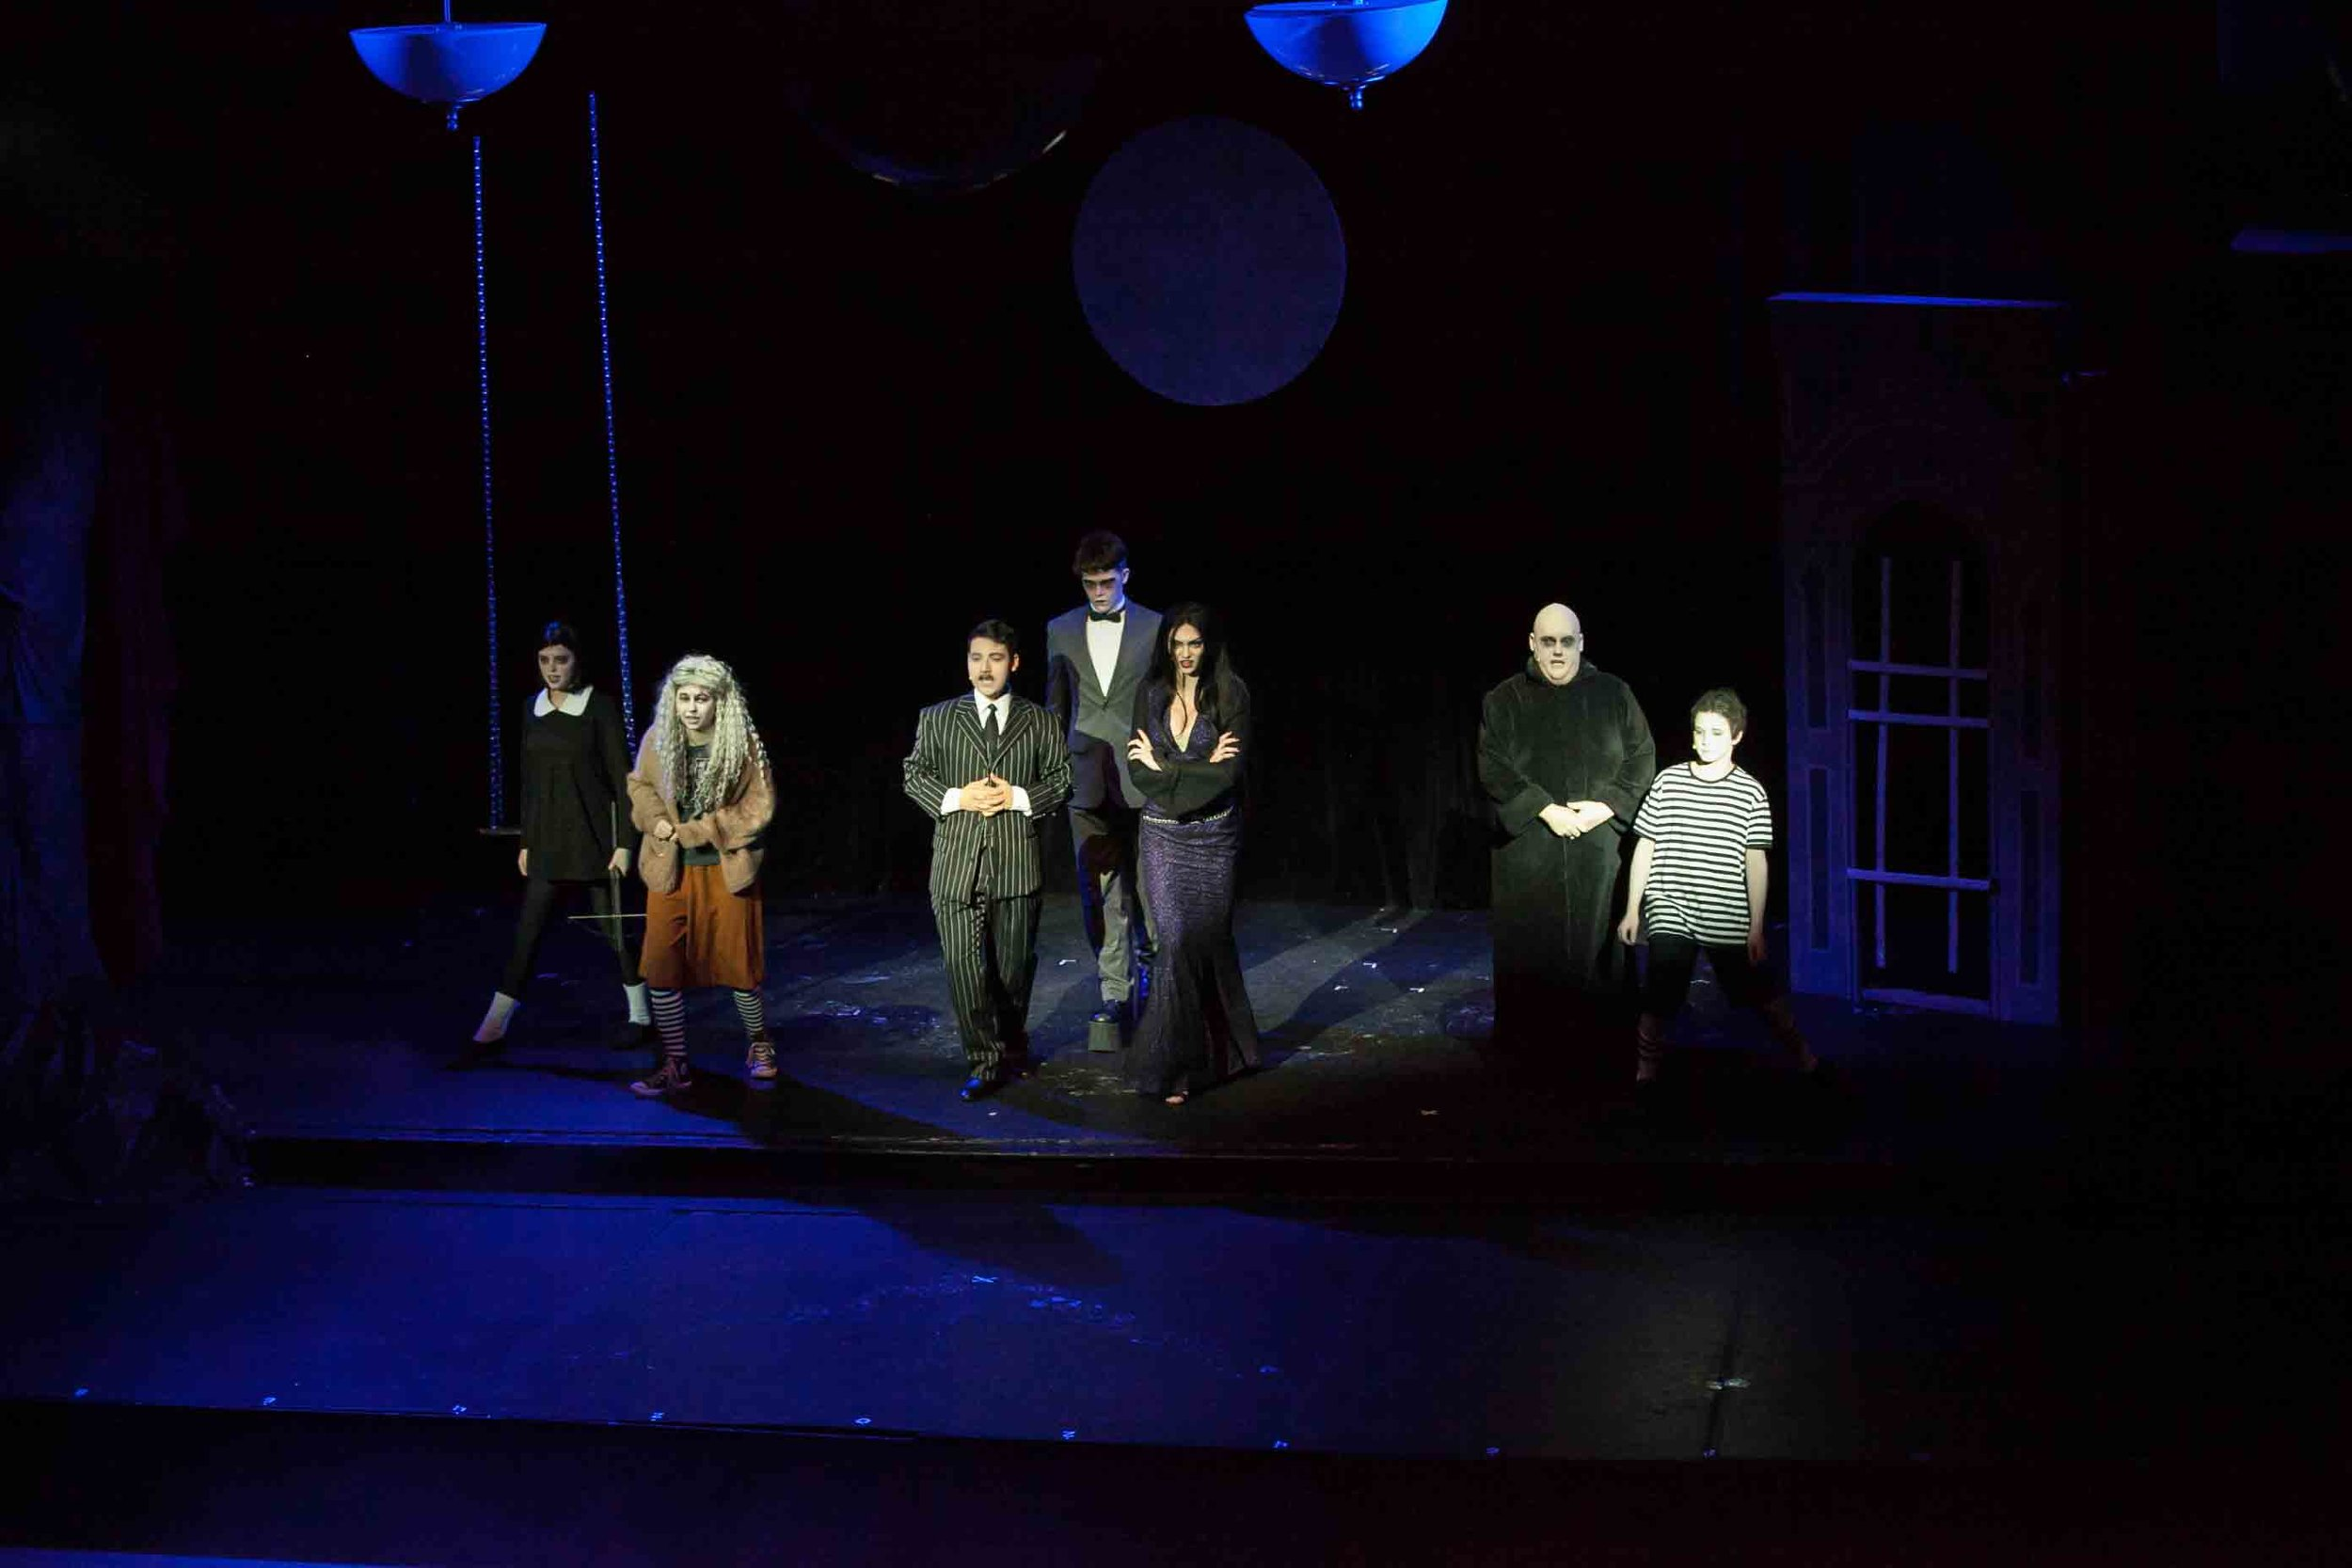 6-19-16 Addams Family Kooky Cast 0024.jpg